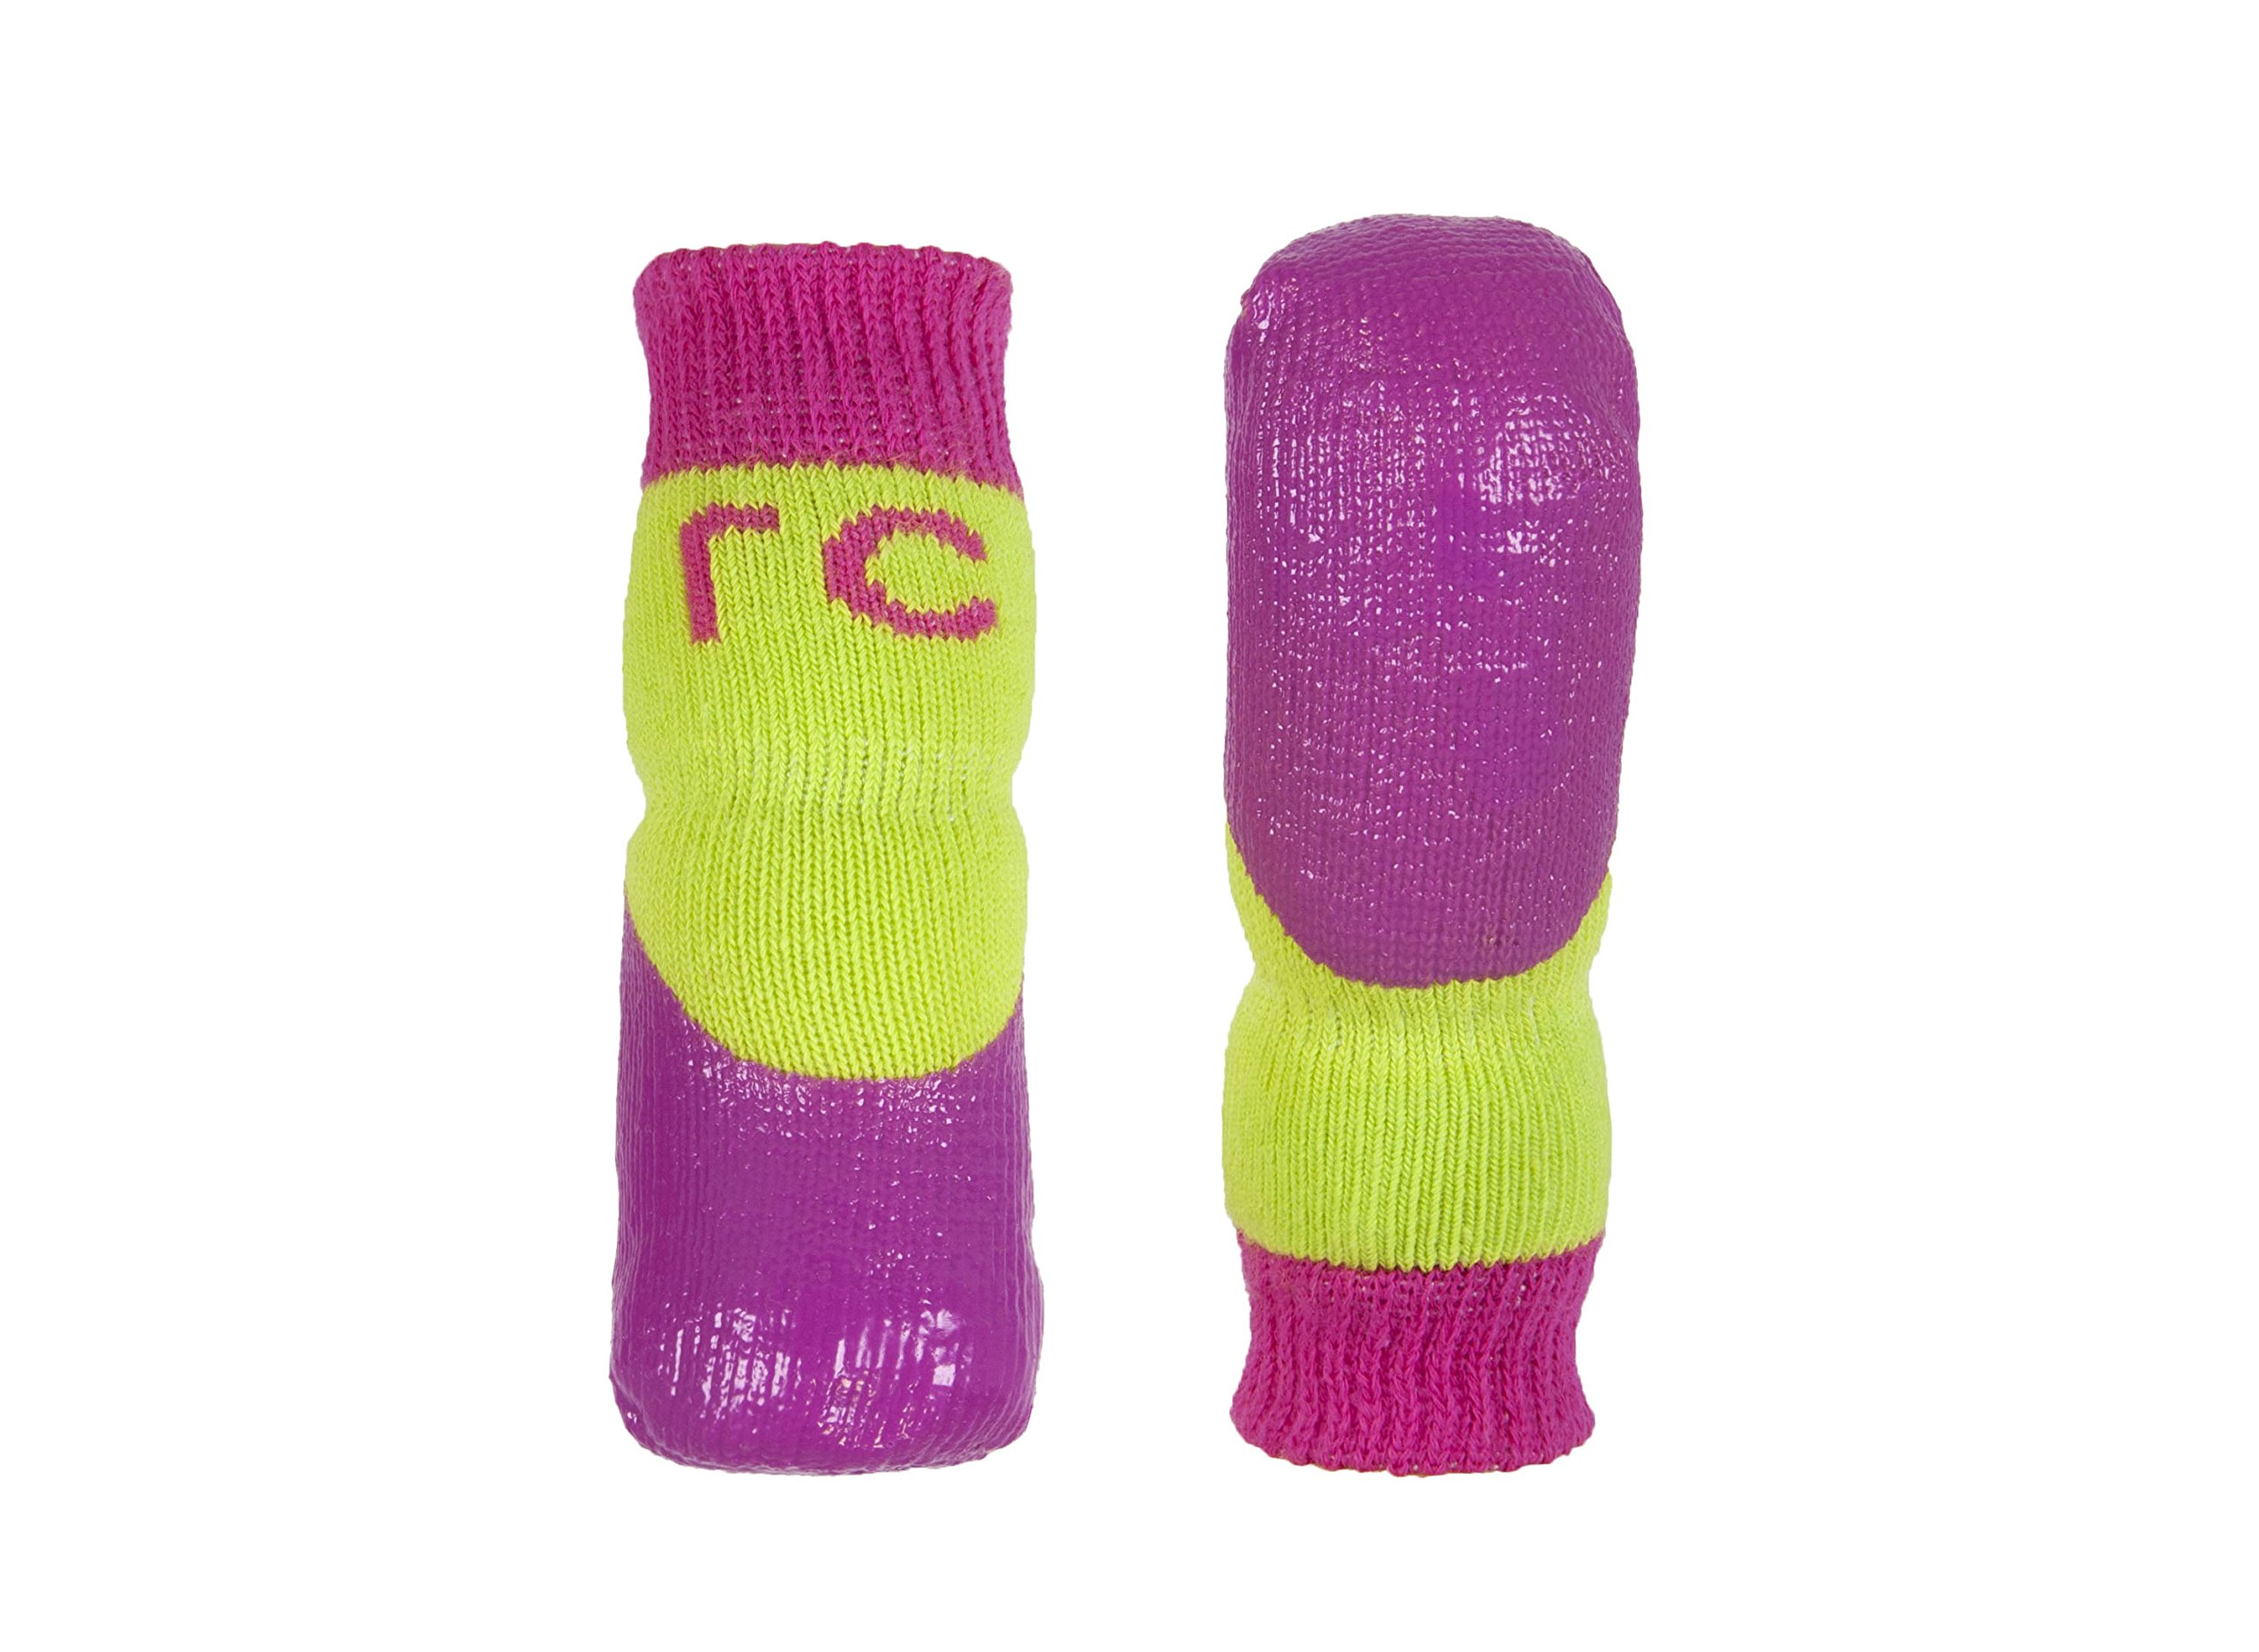 RC Pet Products Sport Pawks Dog Socks, Lime/Azalea, Large